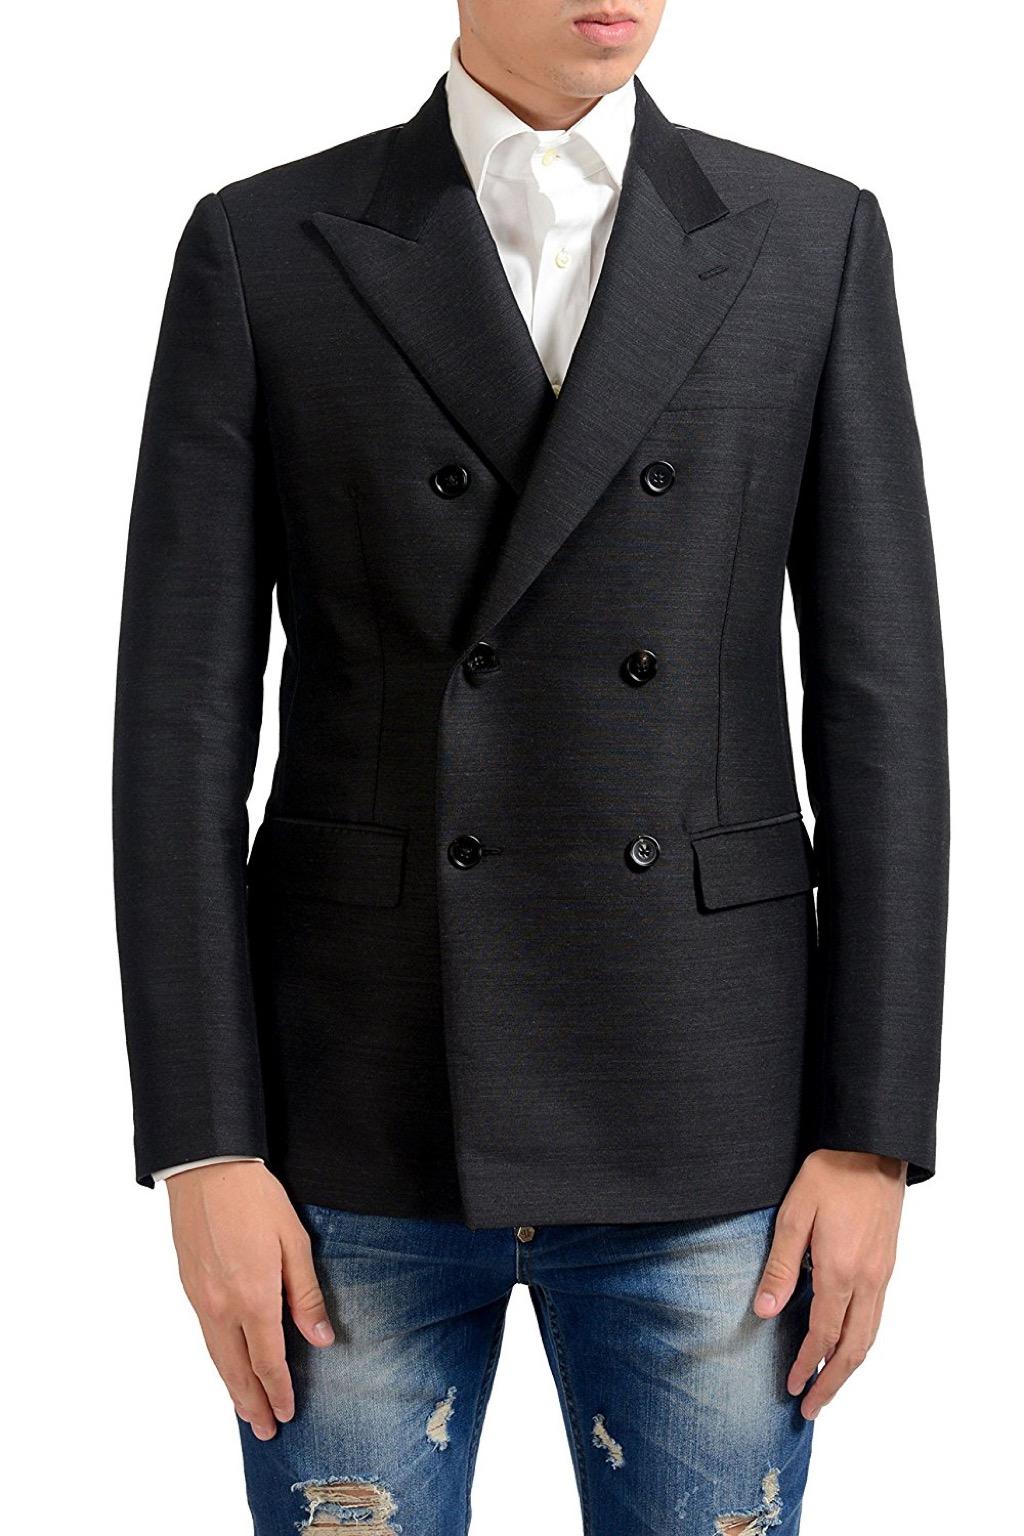 blazer, fall menswear 2017